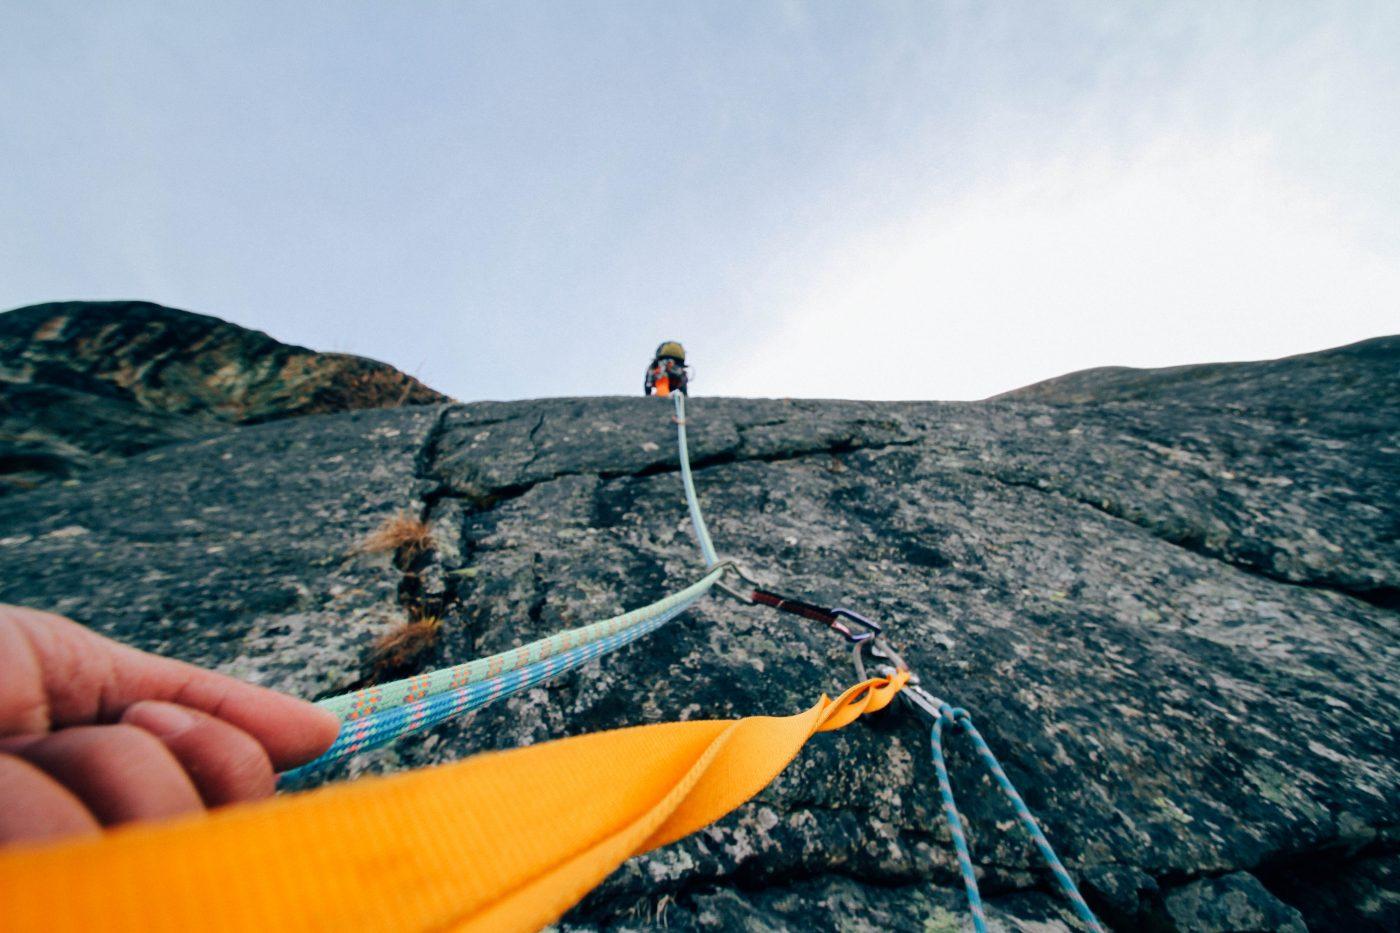 Minimalism: Mountain climbing